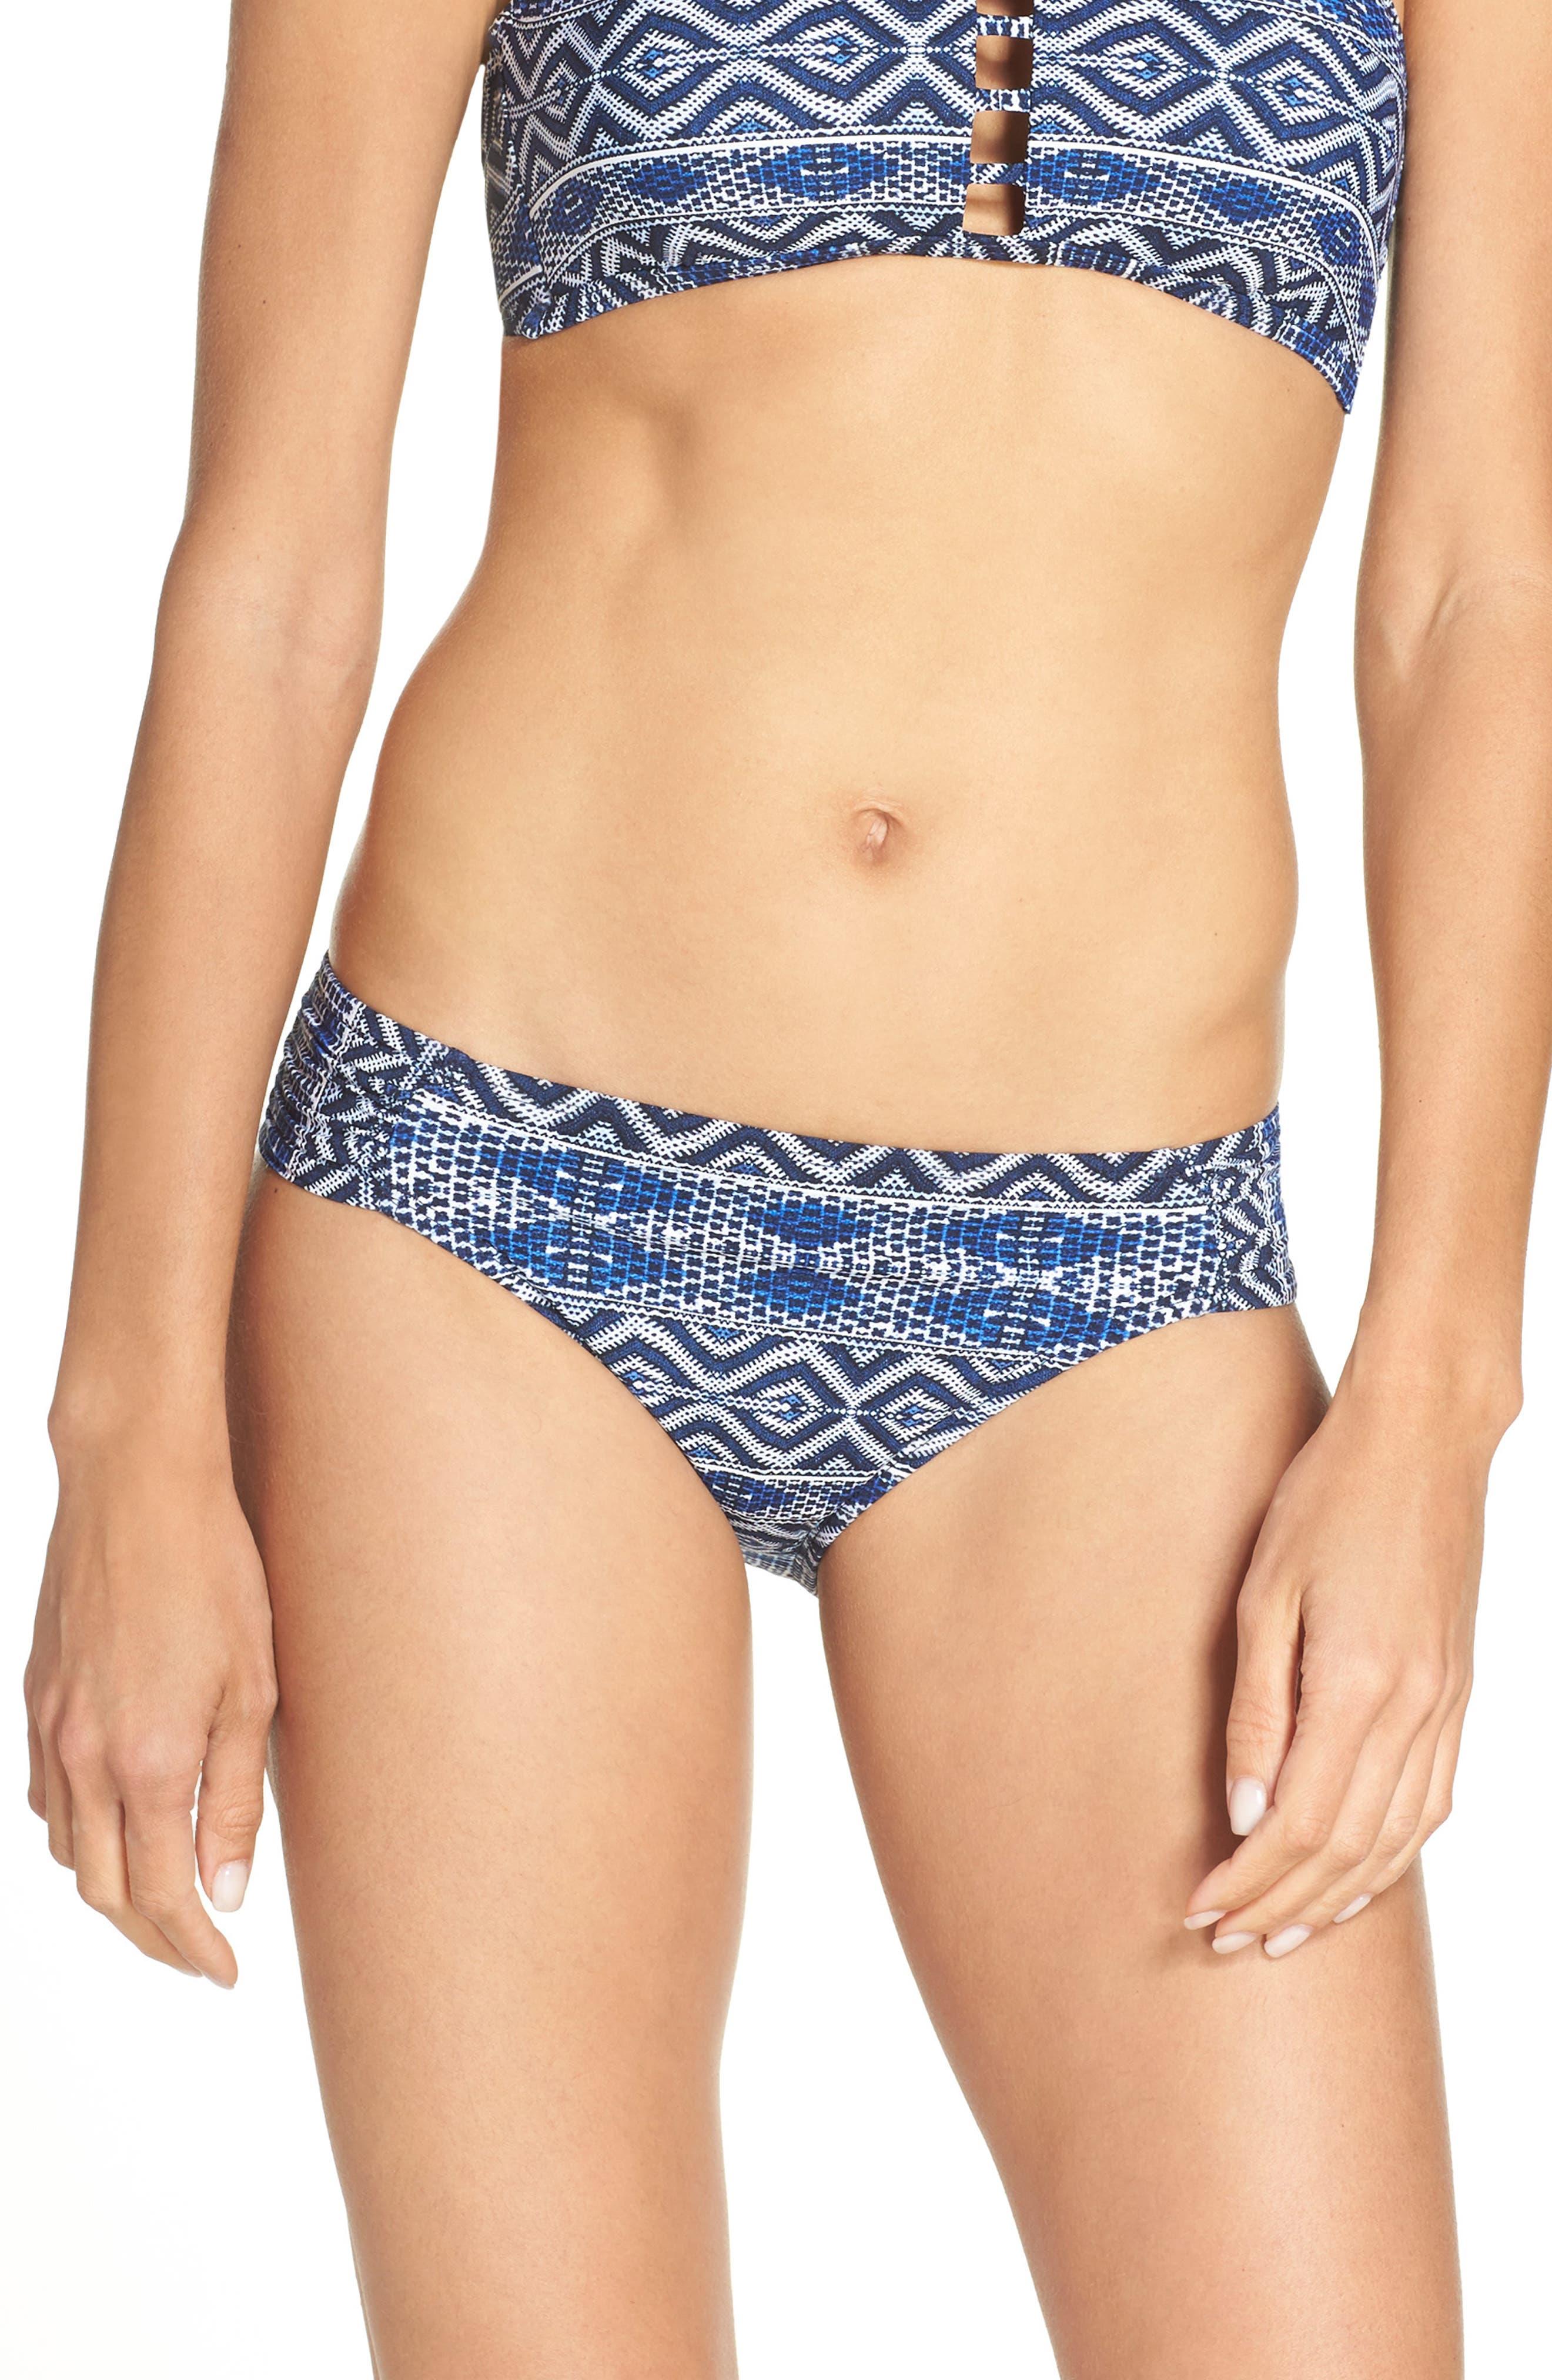 Designer Jeans Hipster Bikini Bottoms,                         Main,                         color, Indigo